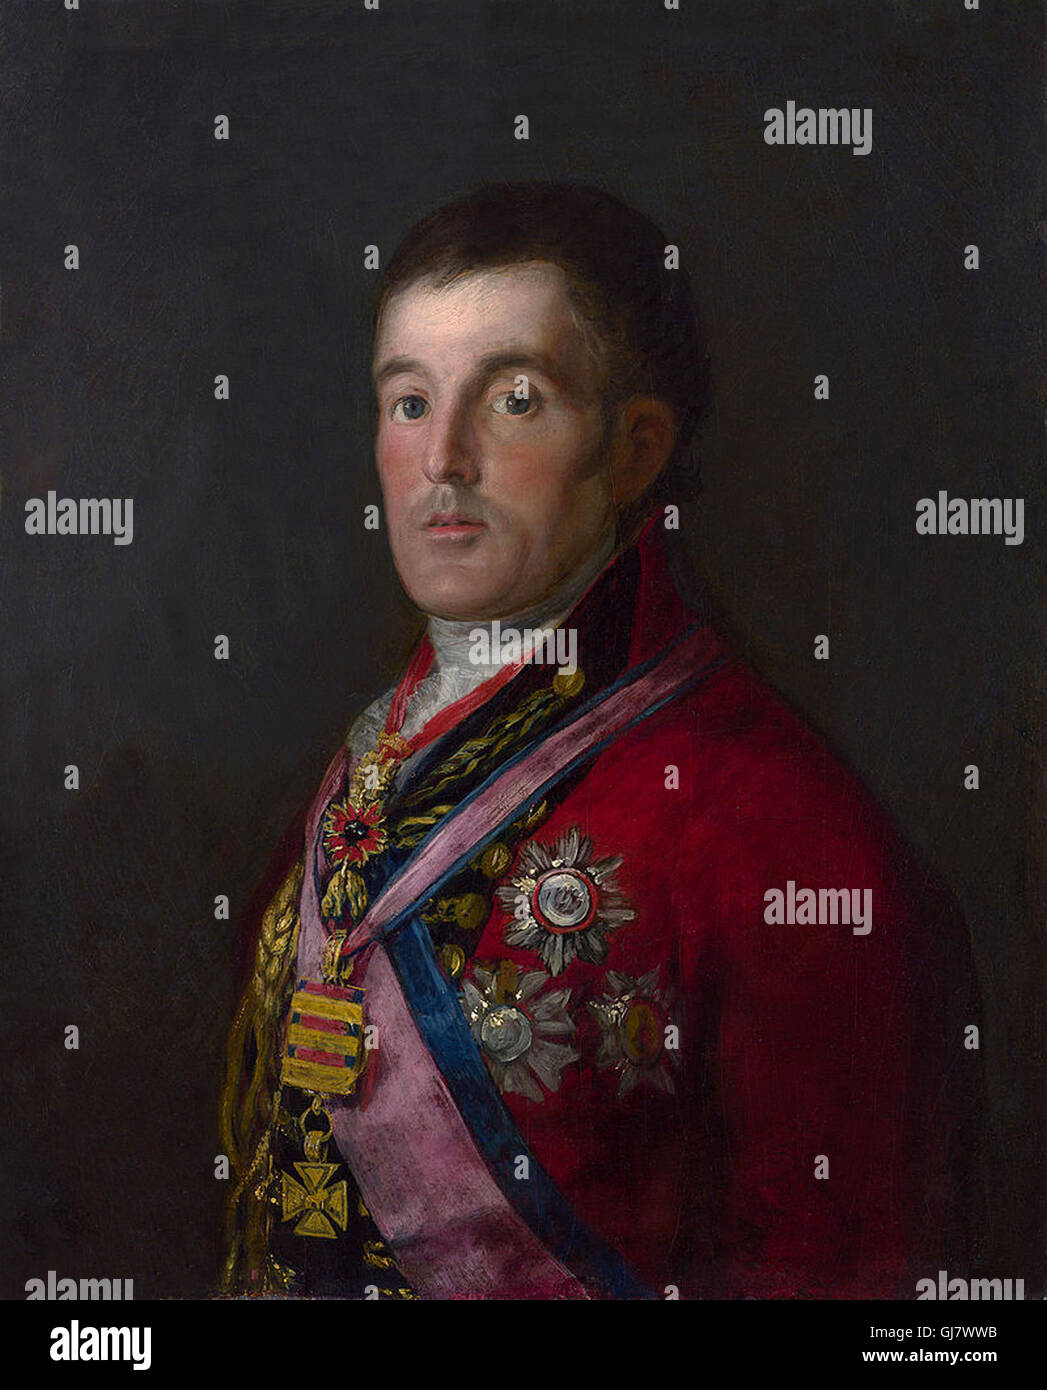 Field Marshal Arthur Wellesley the 1st Duke of Wellington wearing field marshal's uniform. Portrait by Francisco Stock Photo